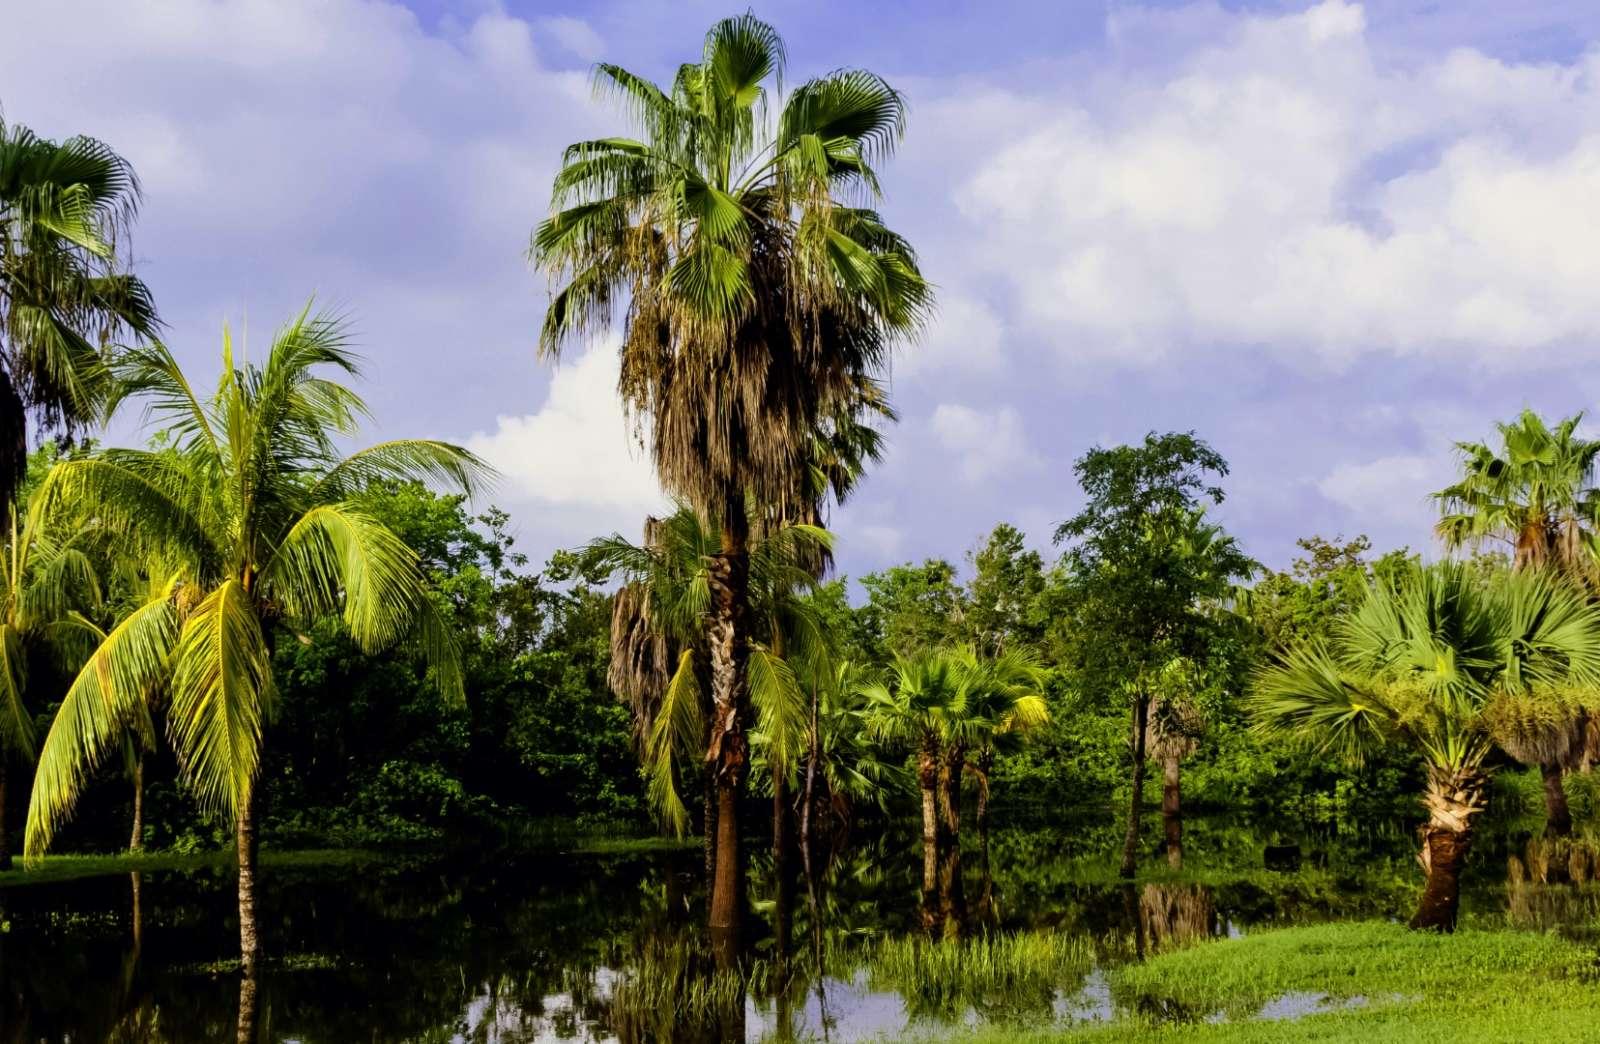 Mangrove swamp in the Zapata Peninsula of Cuba